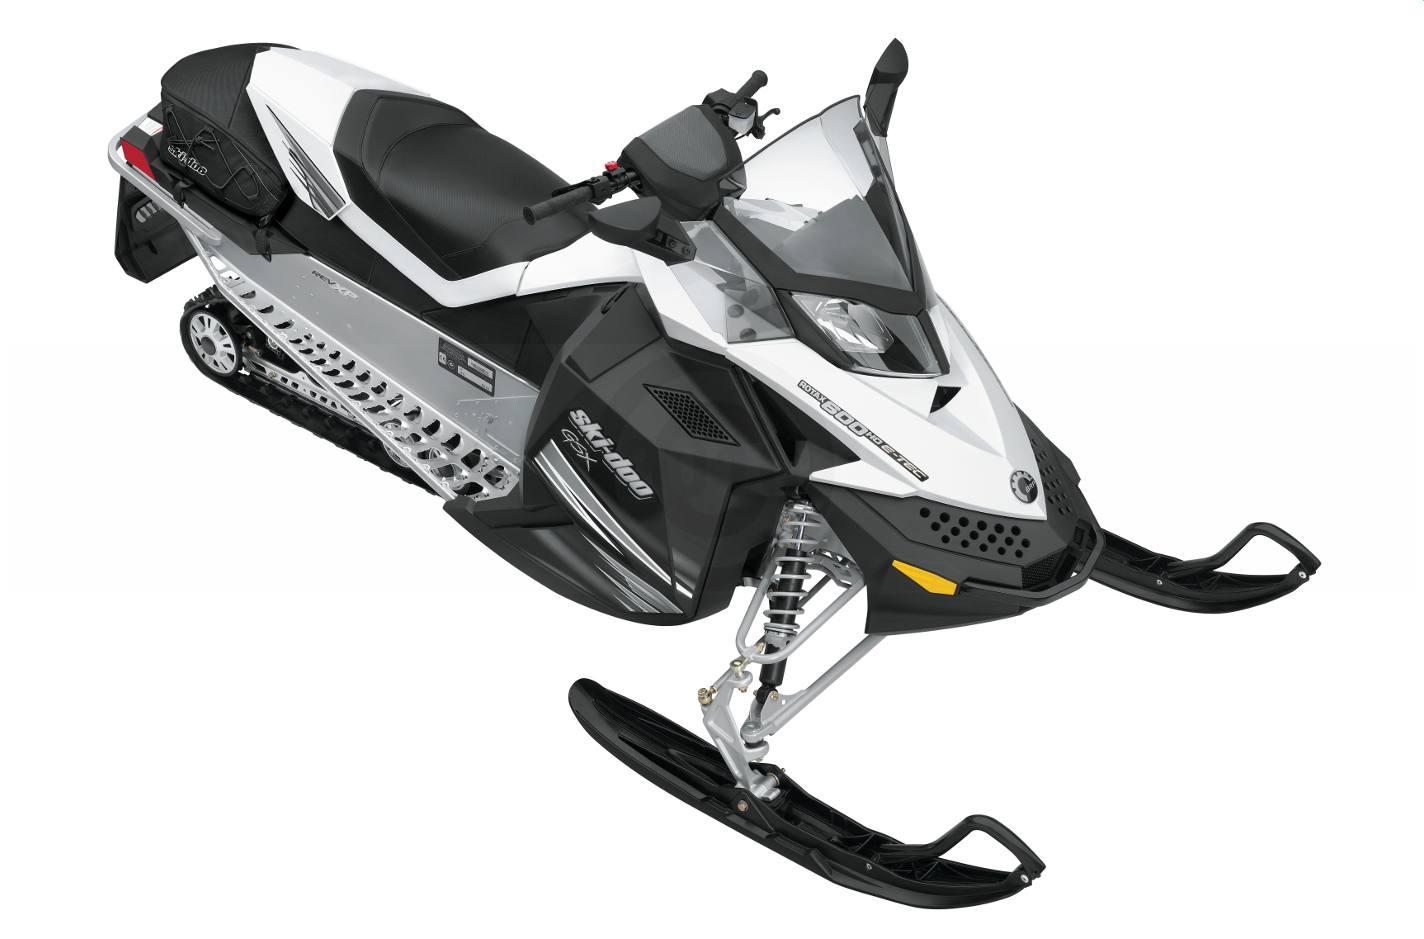 2010 Ski-Doo GSX® LE 600 HO for sale in Wingham, ON | Lynn Hoy